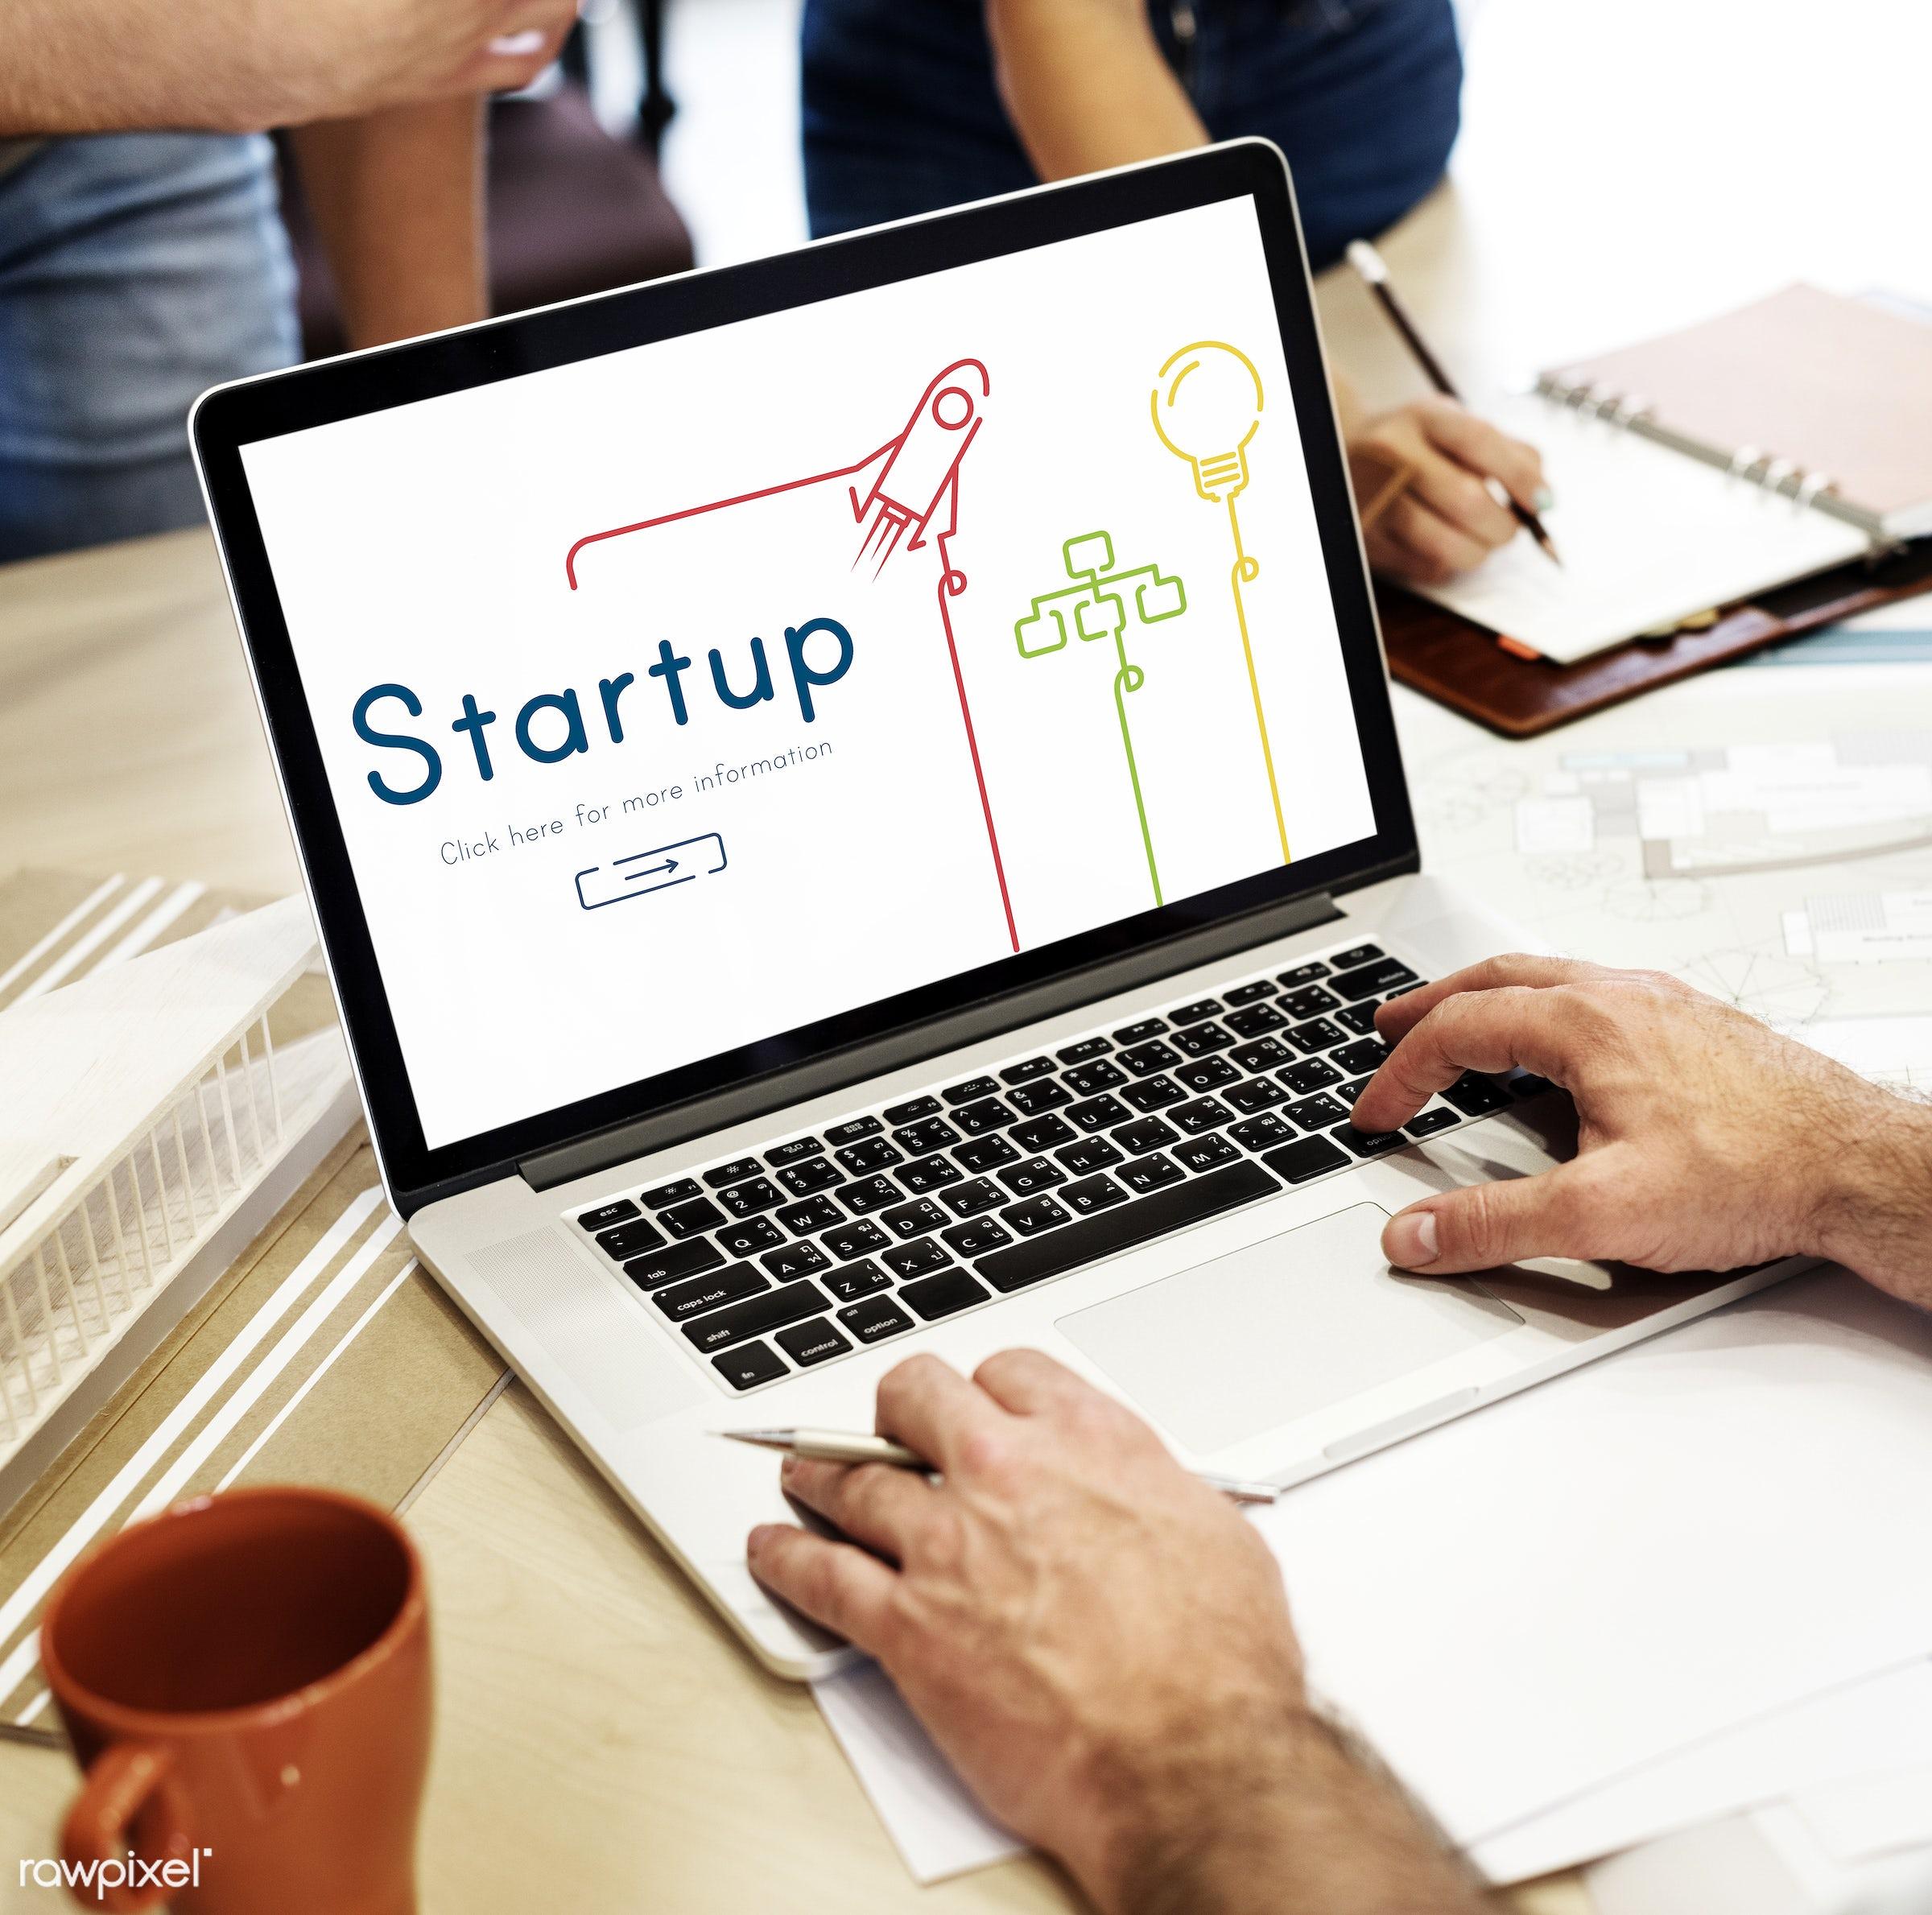 architect, architecture, art, blueprint, business, cloud, coffee, coffee cup, communication, computer, computing storage,...